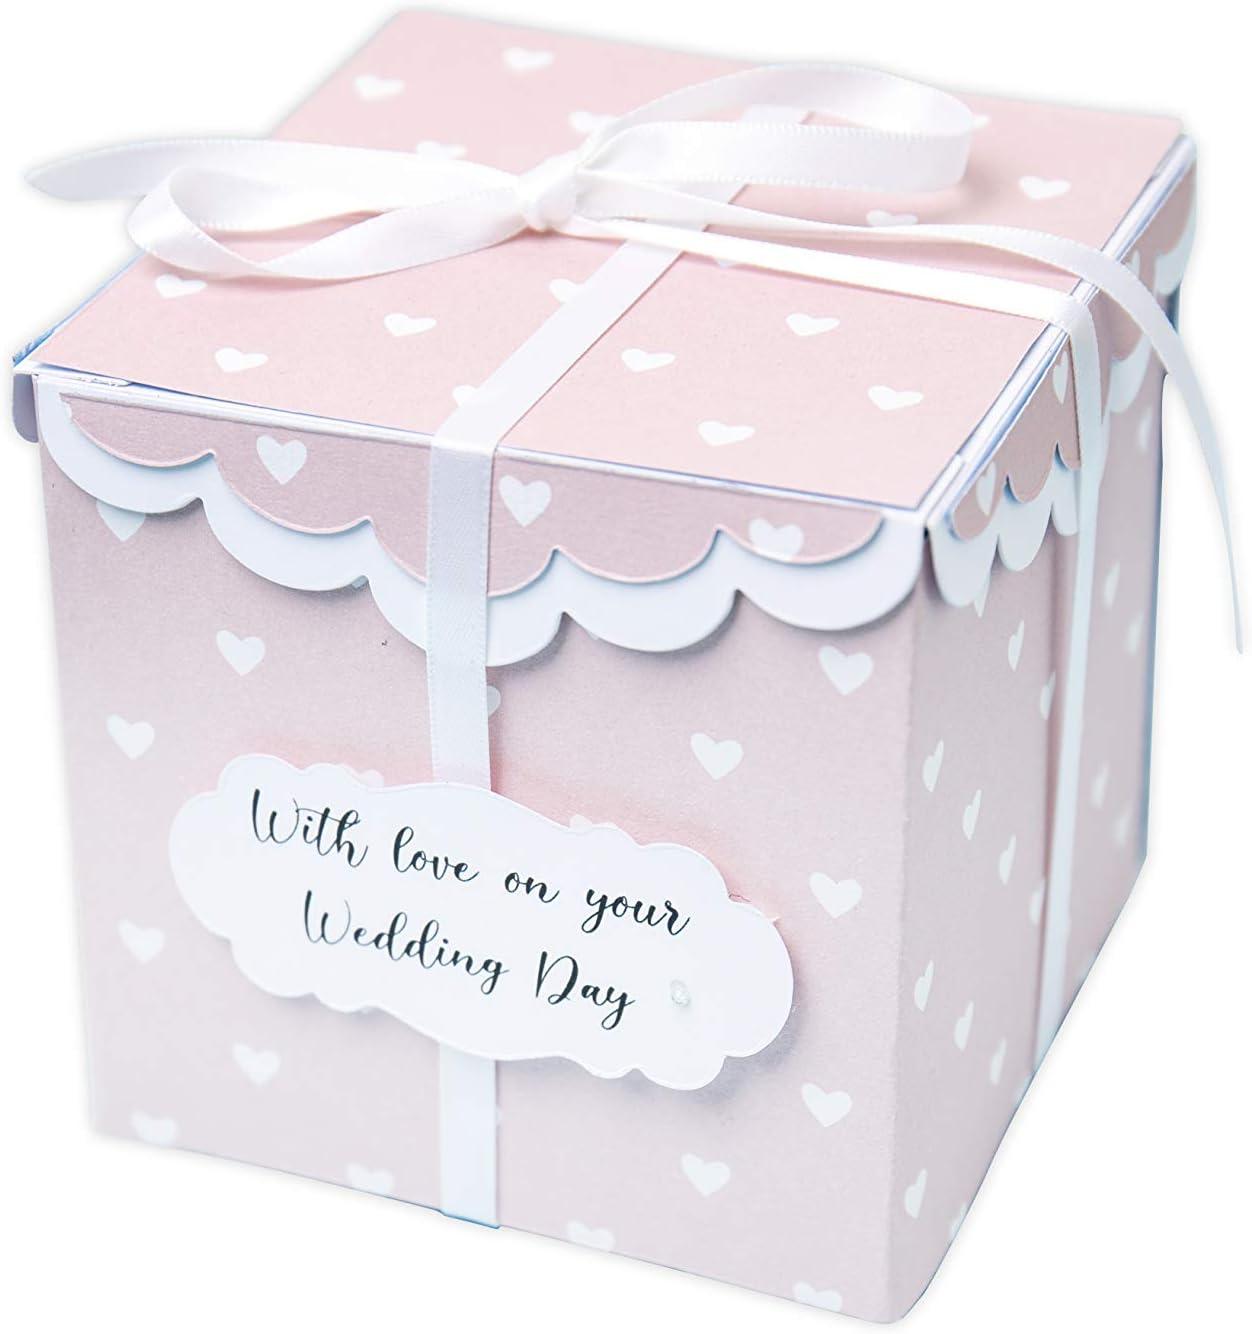 Sizzix Box, Gift w/Scallop Edges에 대한 이미지 검색결과